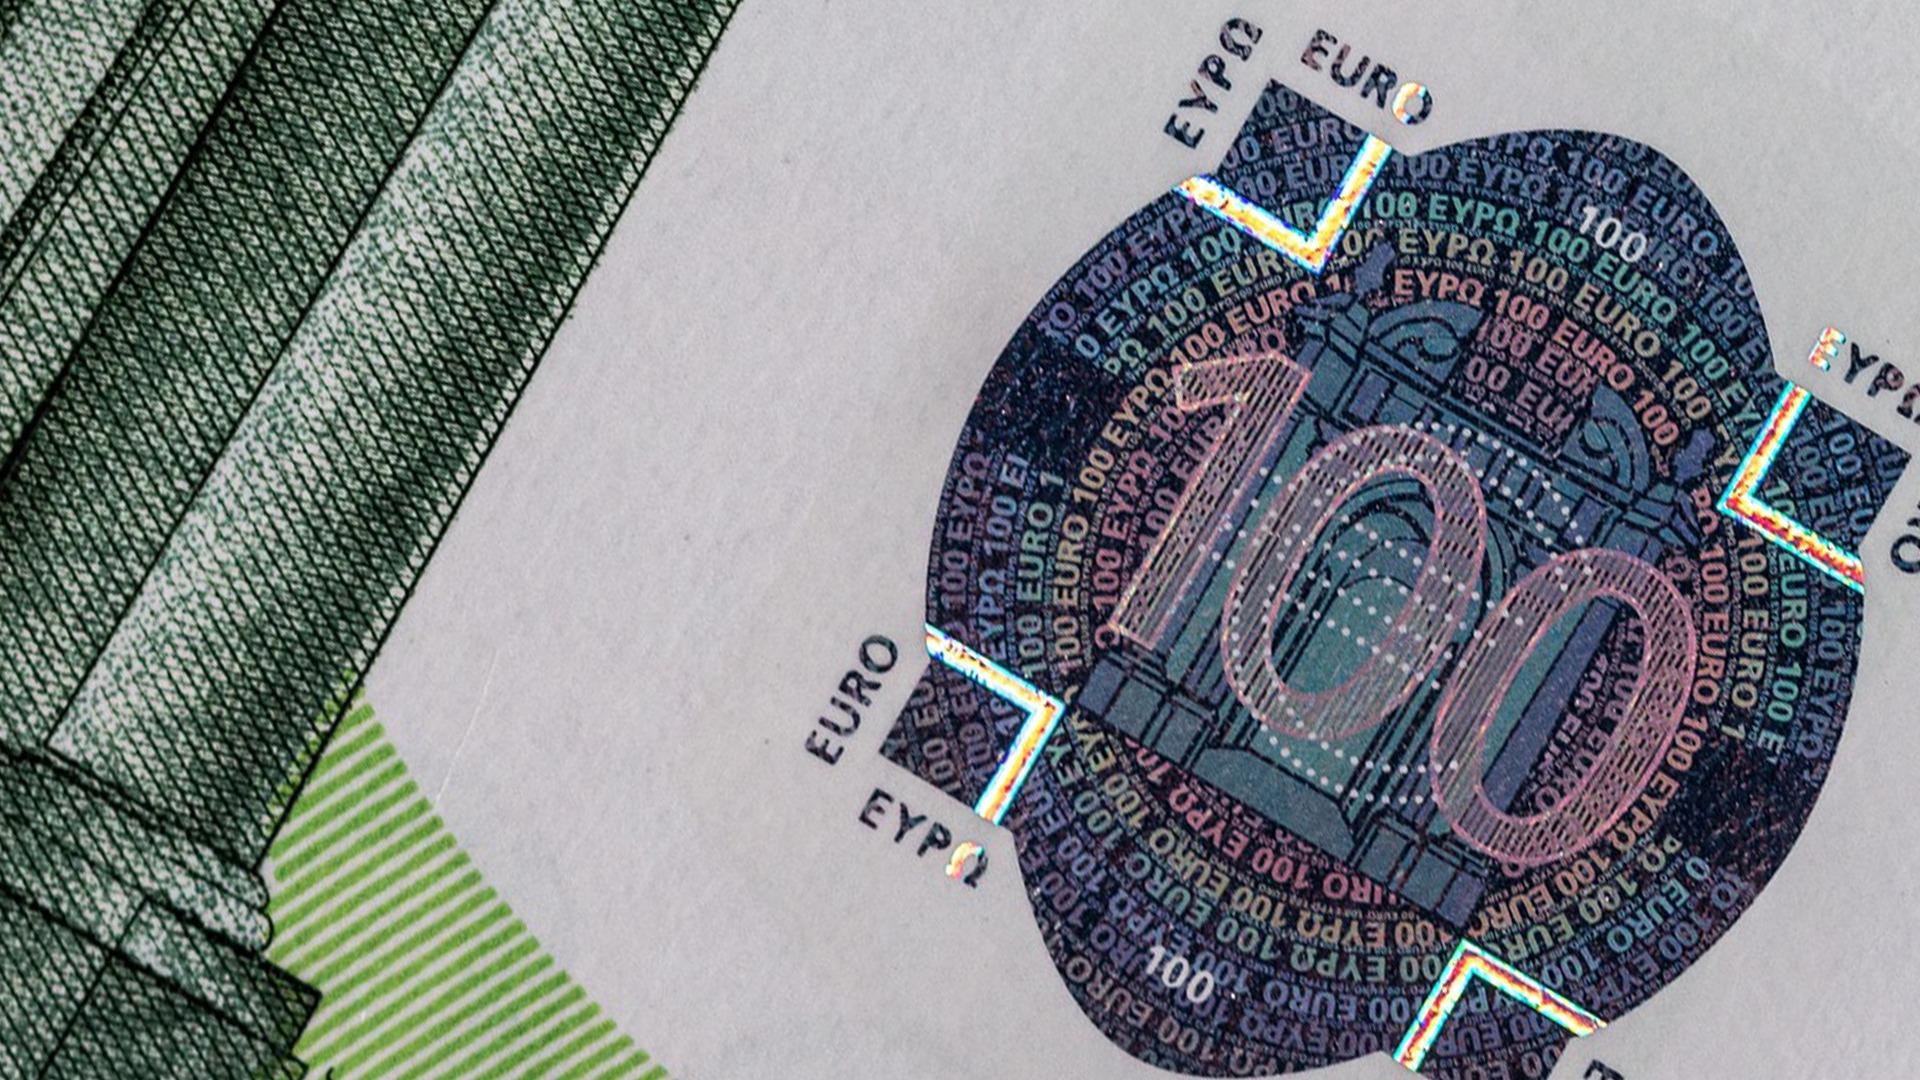 Voka wil 100 euro netto extra voor lage inkomens